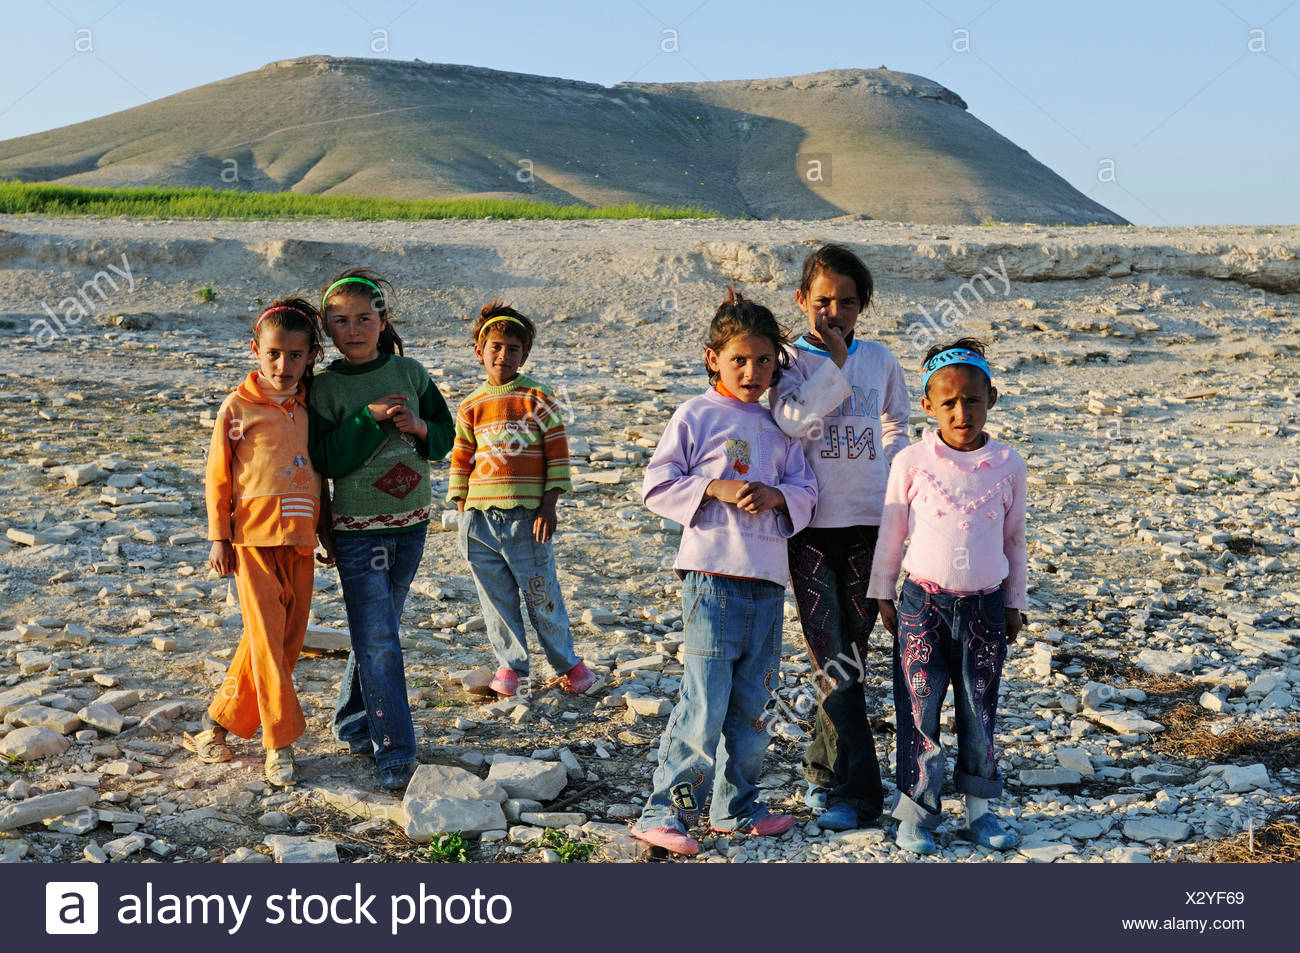 Children on the mountain Jebel Arruda at the Asad reservoir of the Euphrates, Syria, Asia Stock Photo